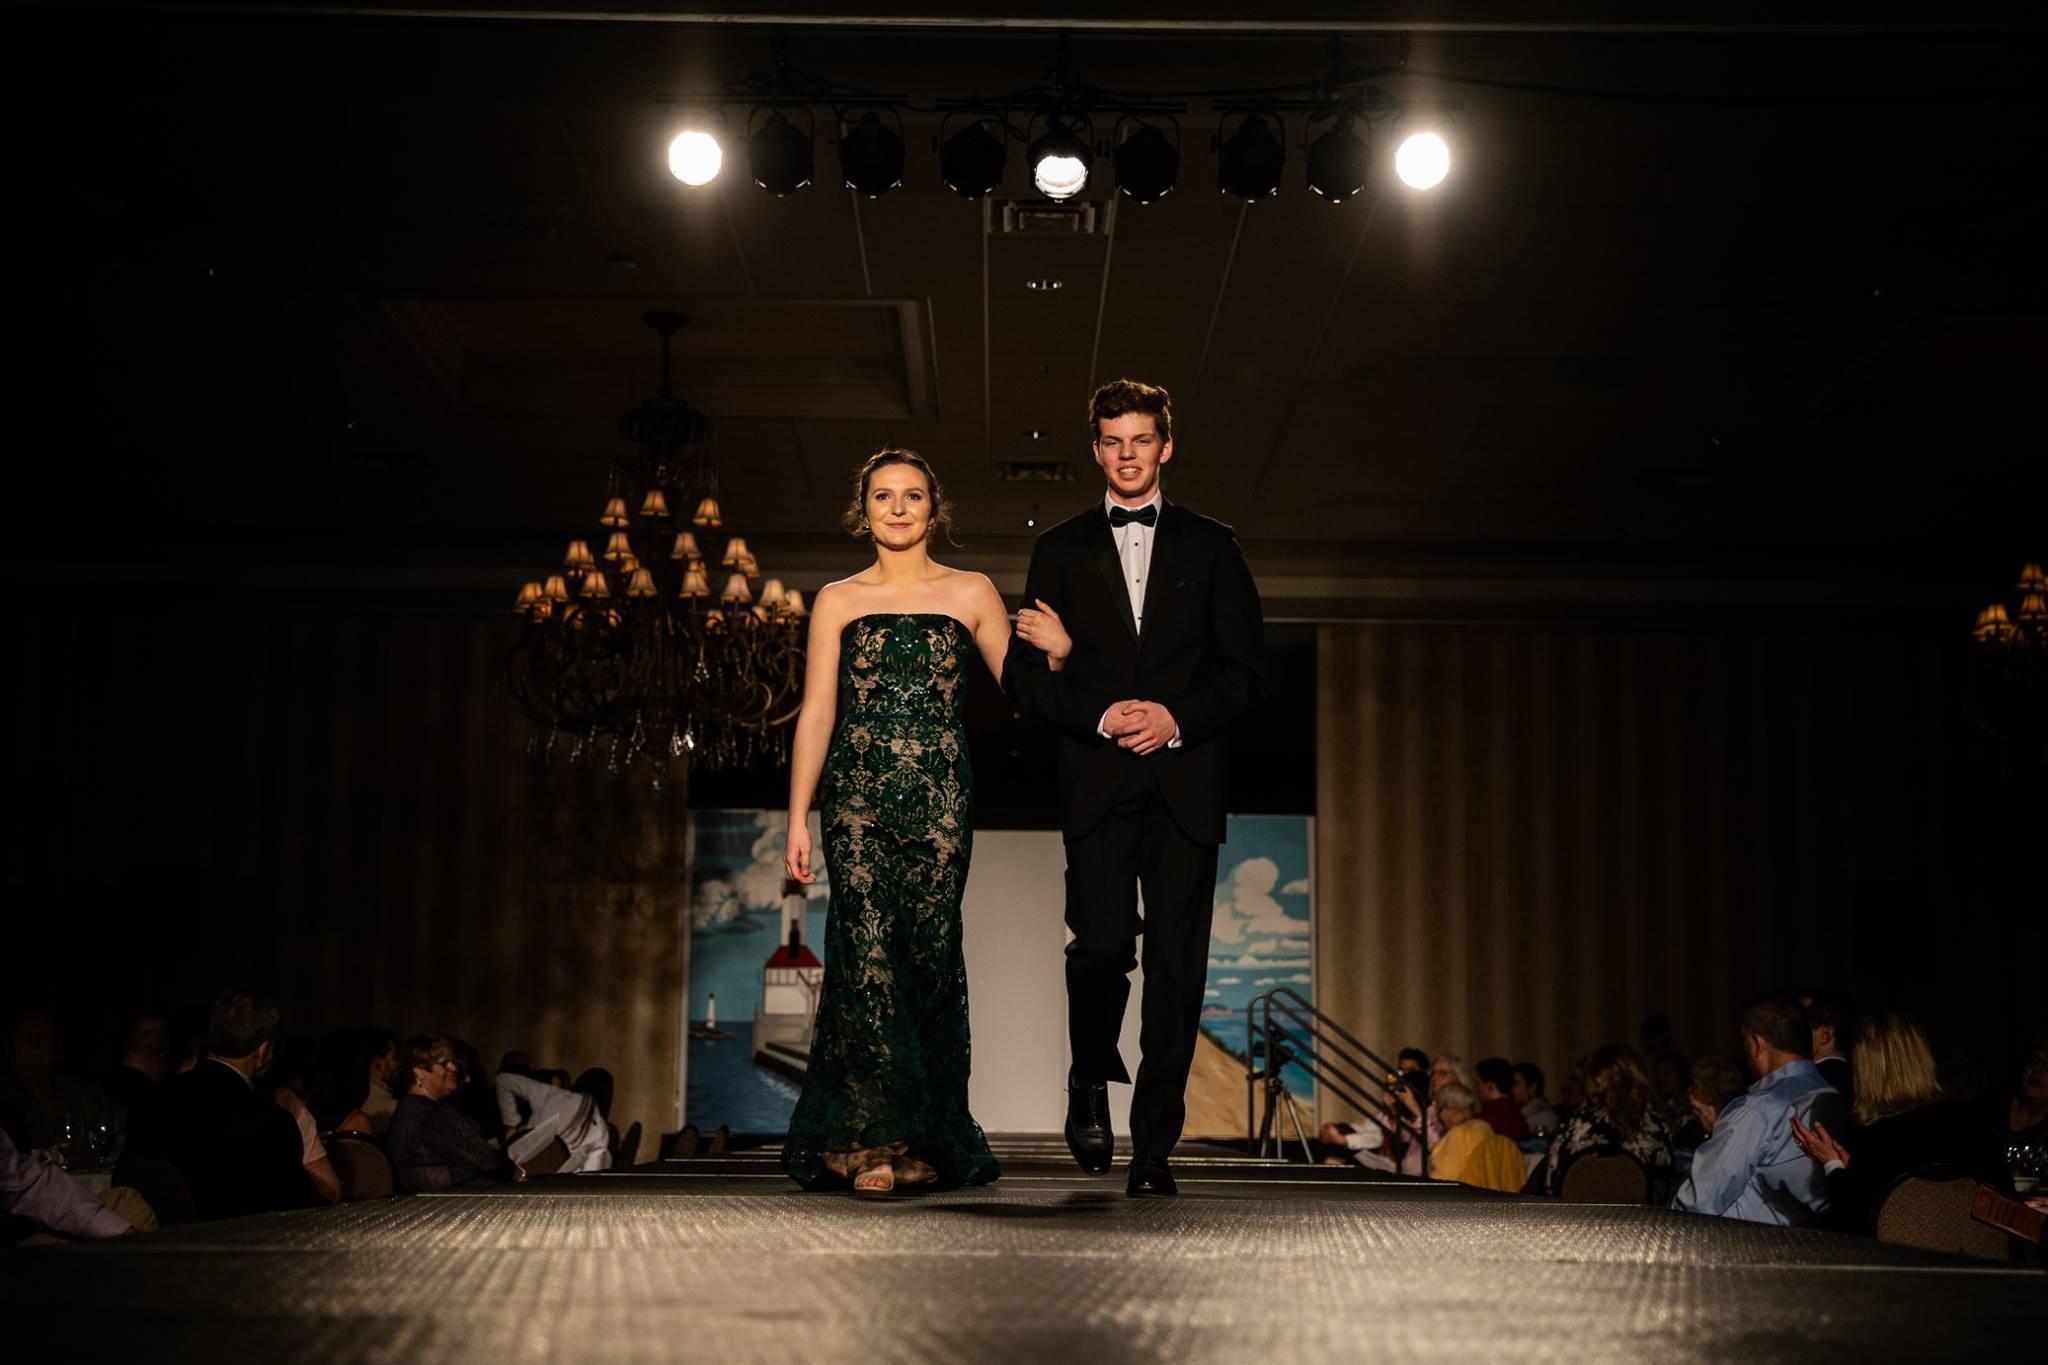 Lutheran_North_High_School_Macomb_Michigan_LHN_Fashion_Show_2019_Seniors (18).jpg